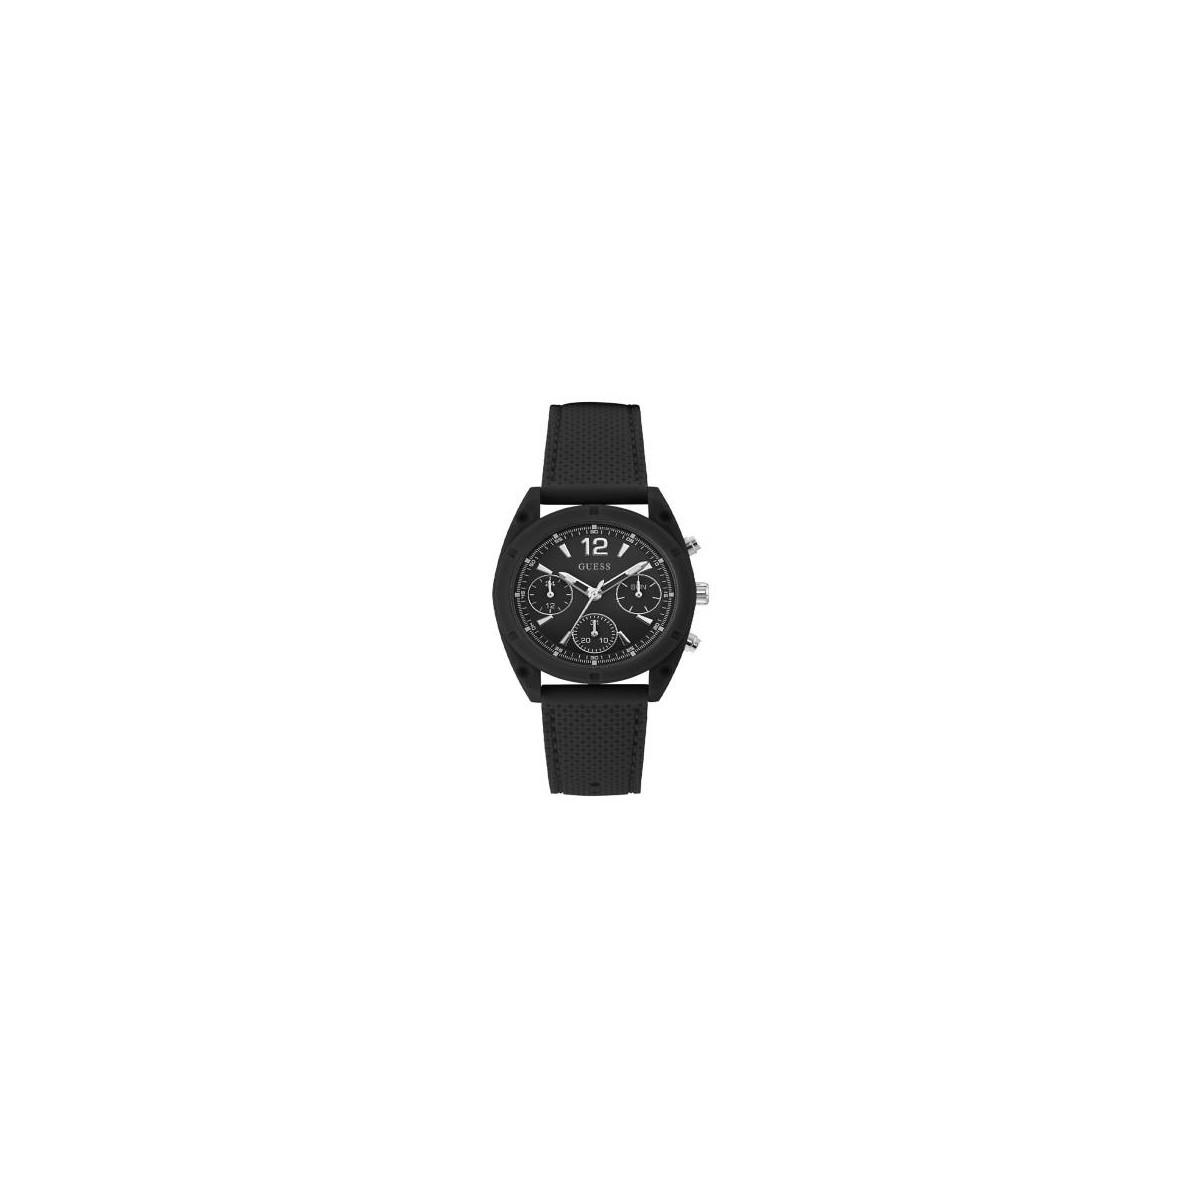 https://www.gaberjoyeria.com/6302-thickbox_default/reloj-guess-dart.jpg